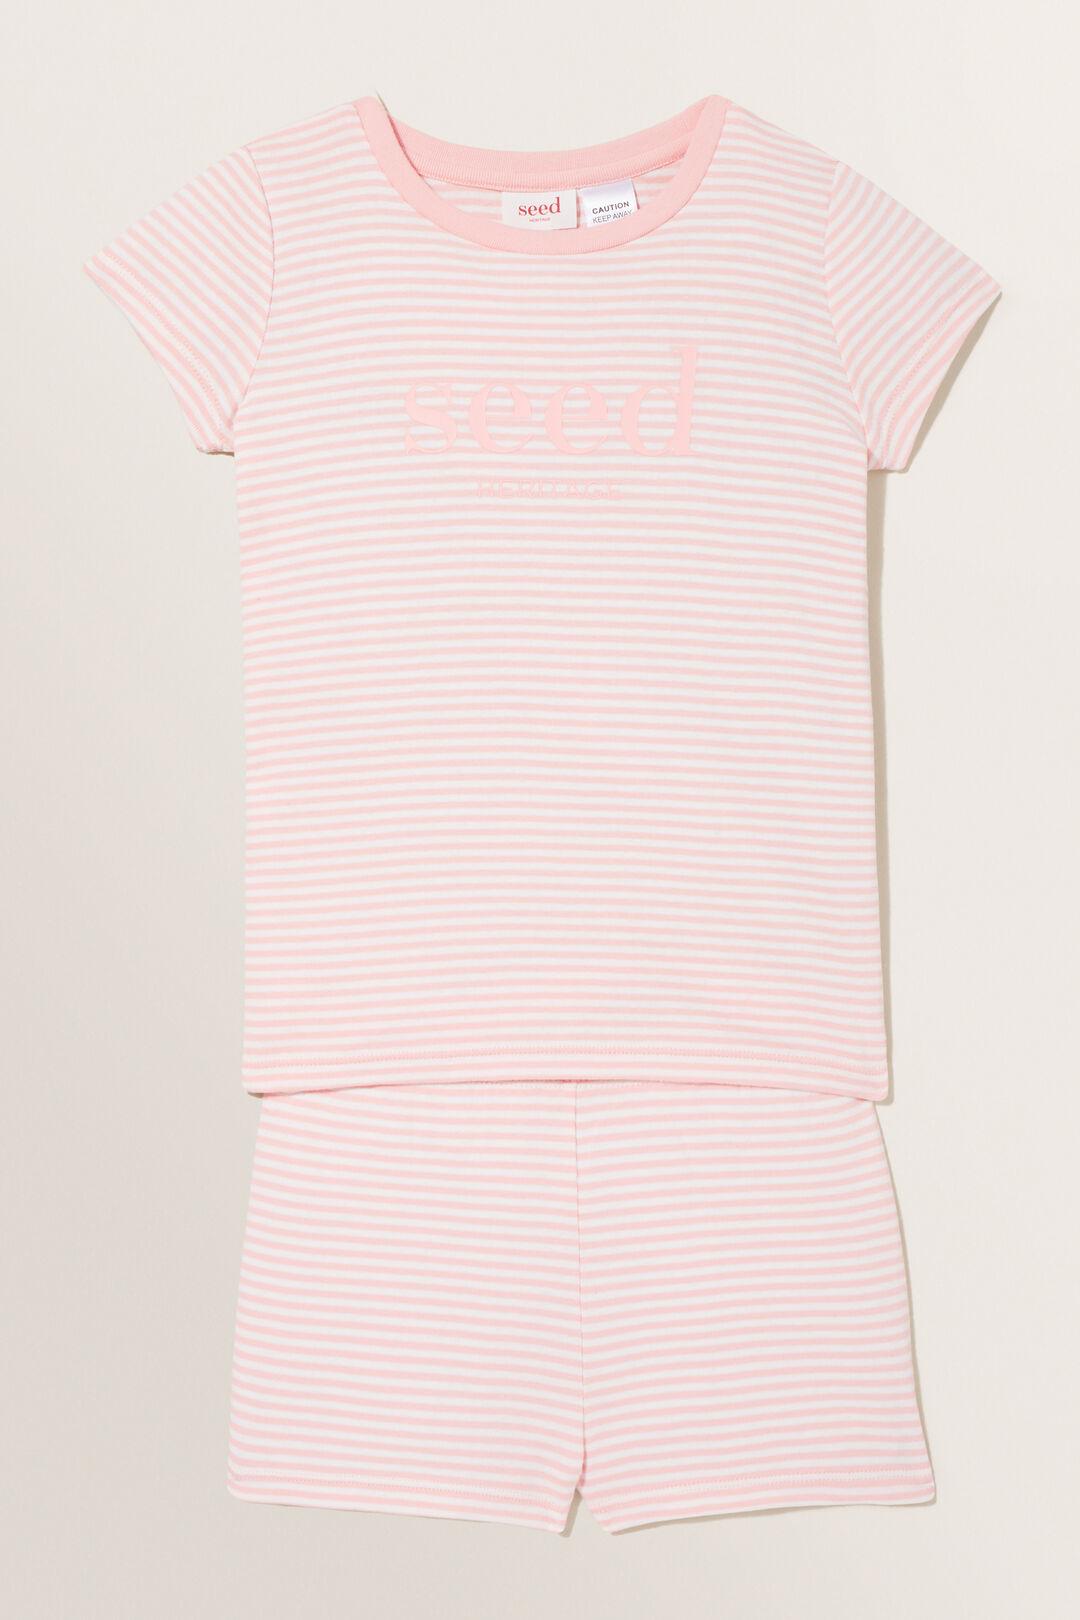 Seed Logo Pyjamas  Dusty Rose  hi-res